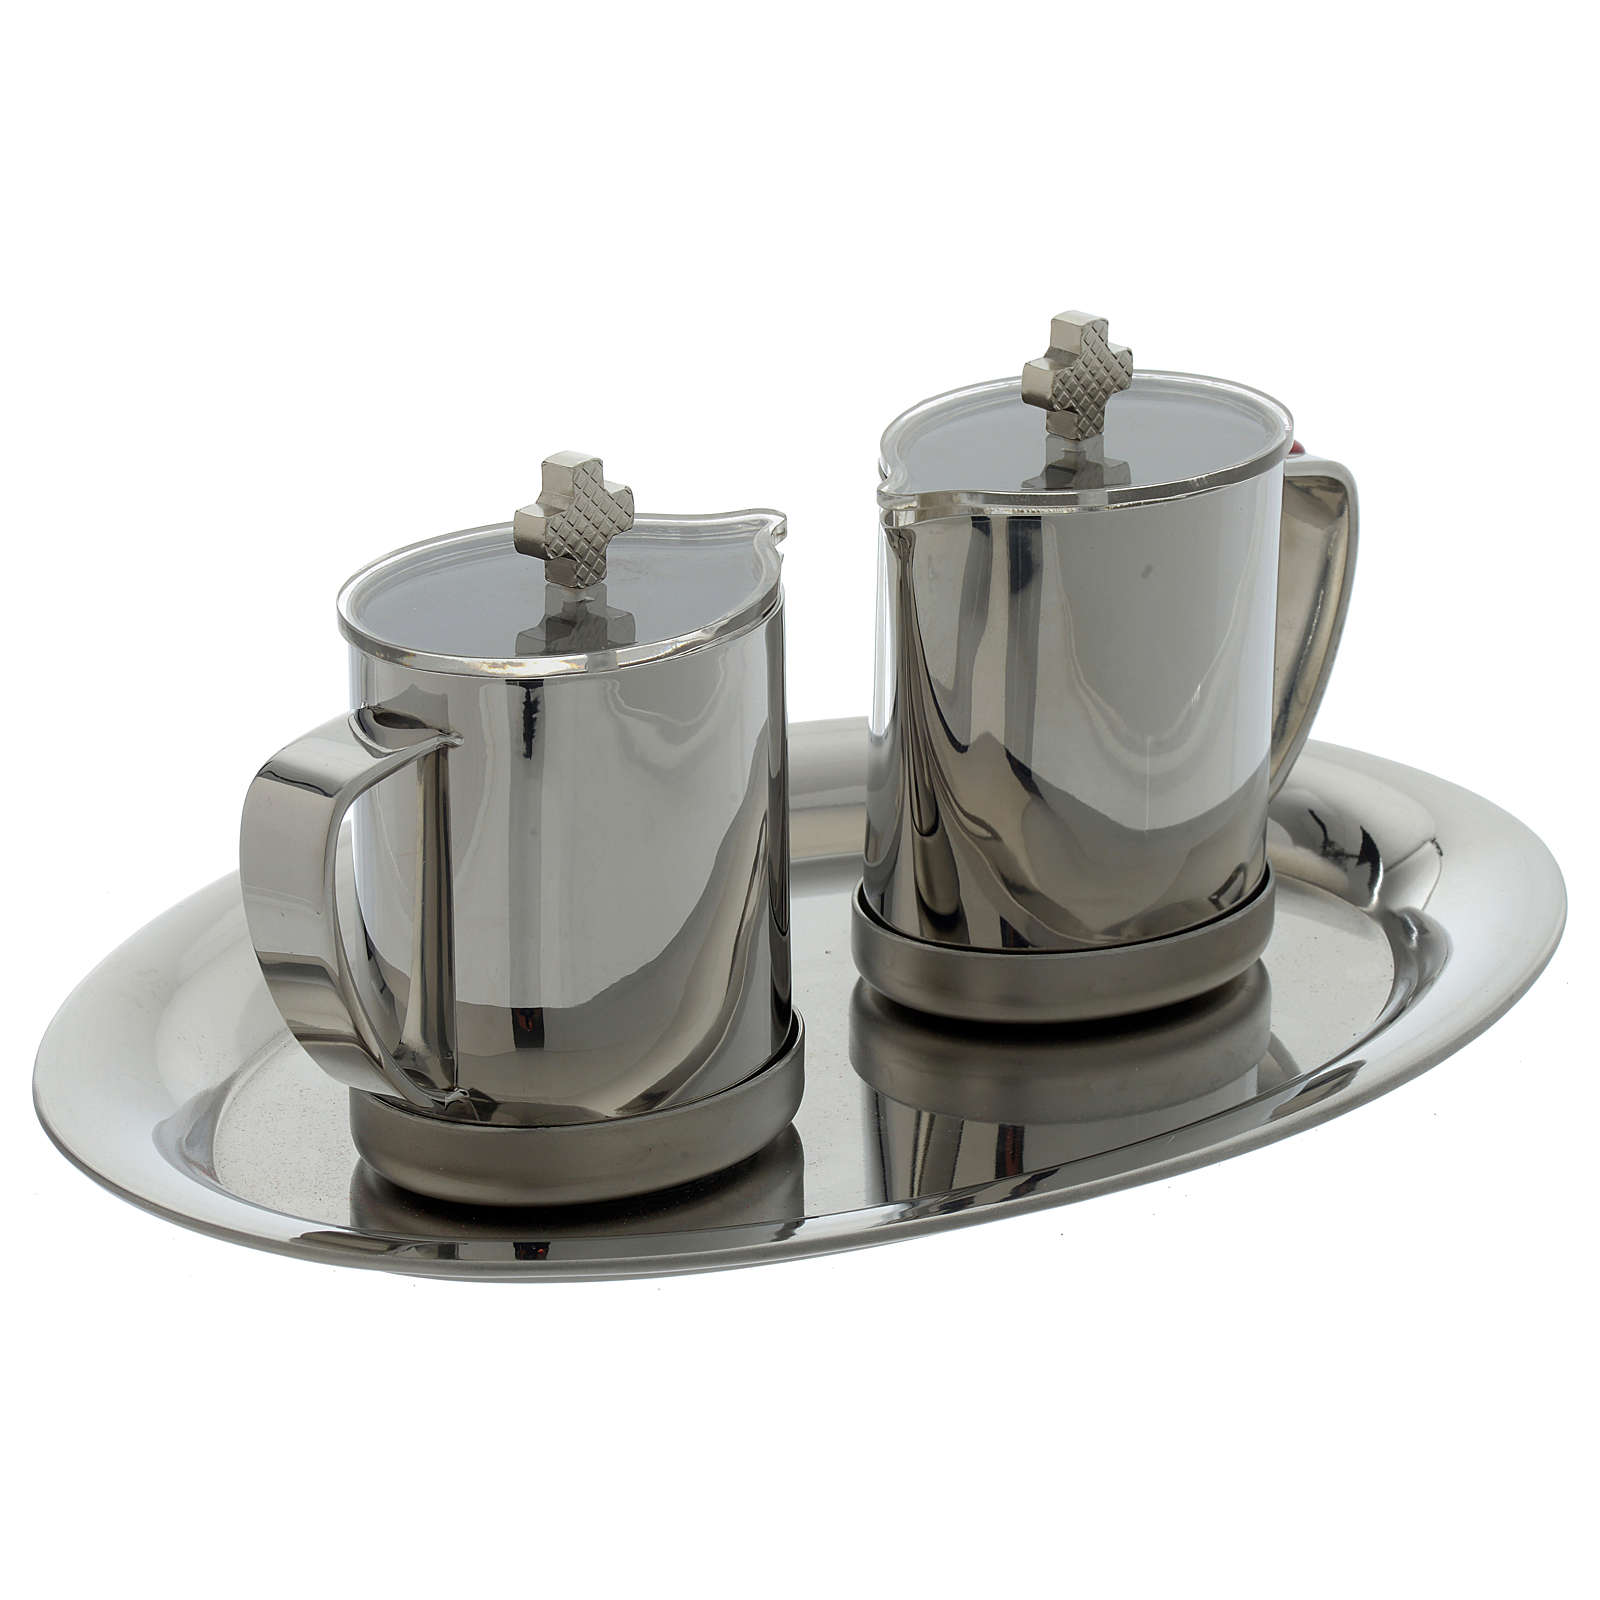 Stainelss steel cruets metal handle 4